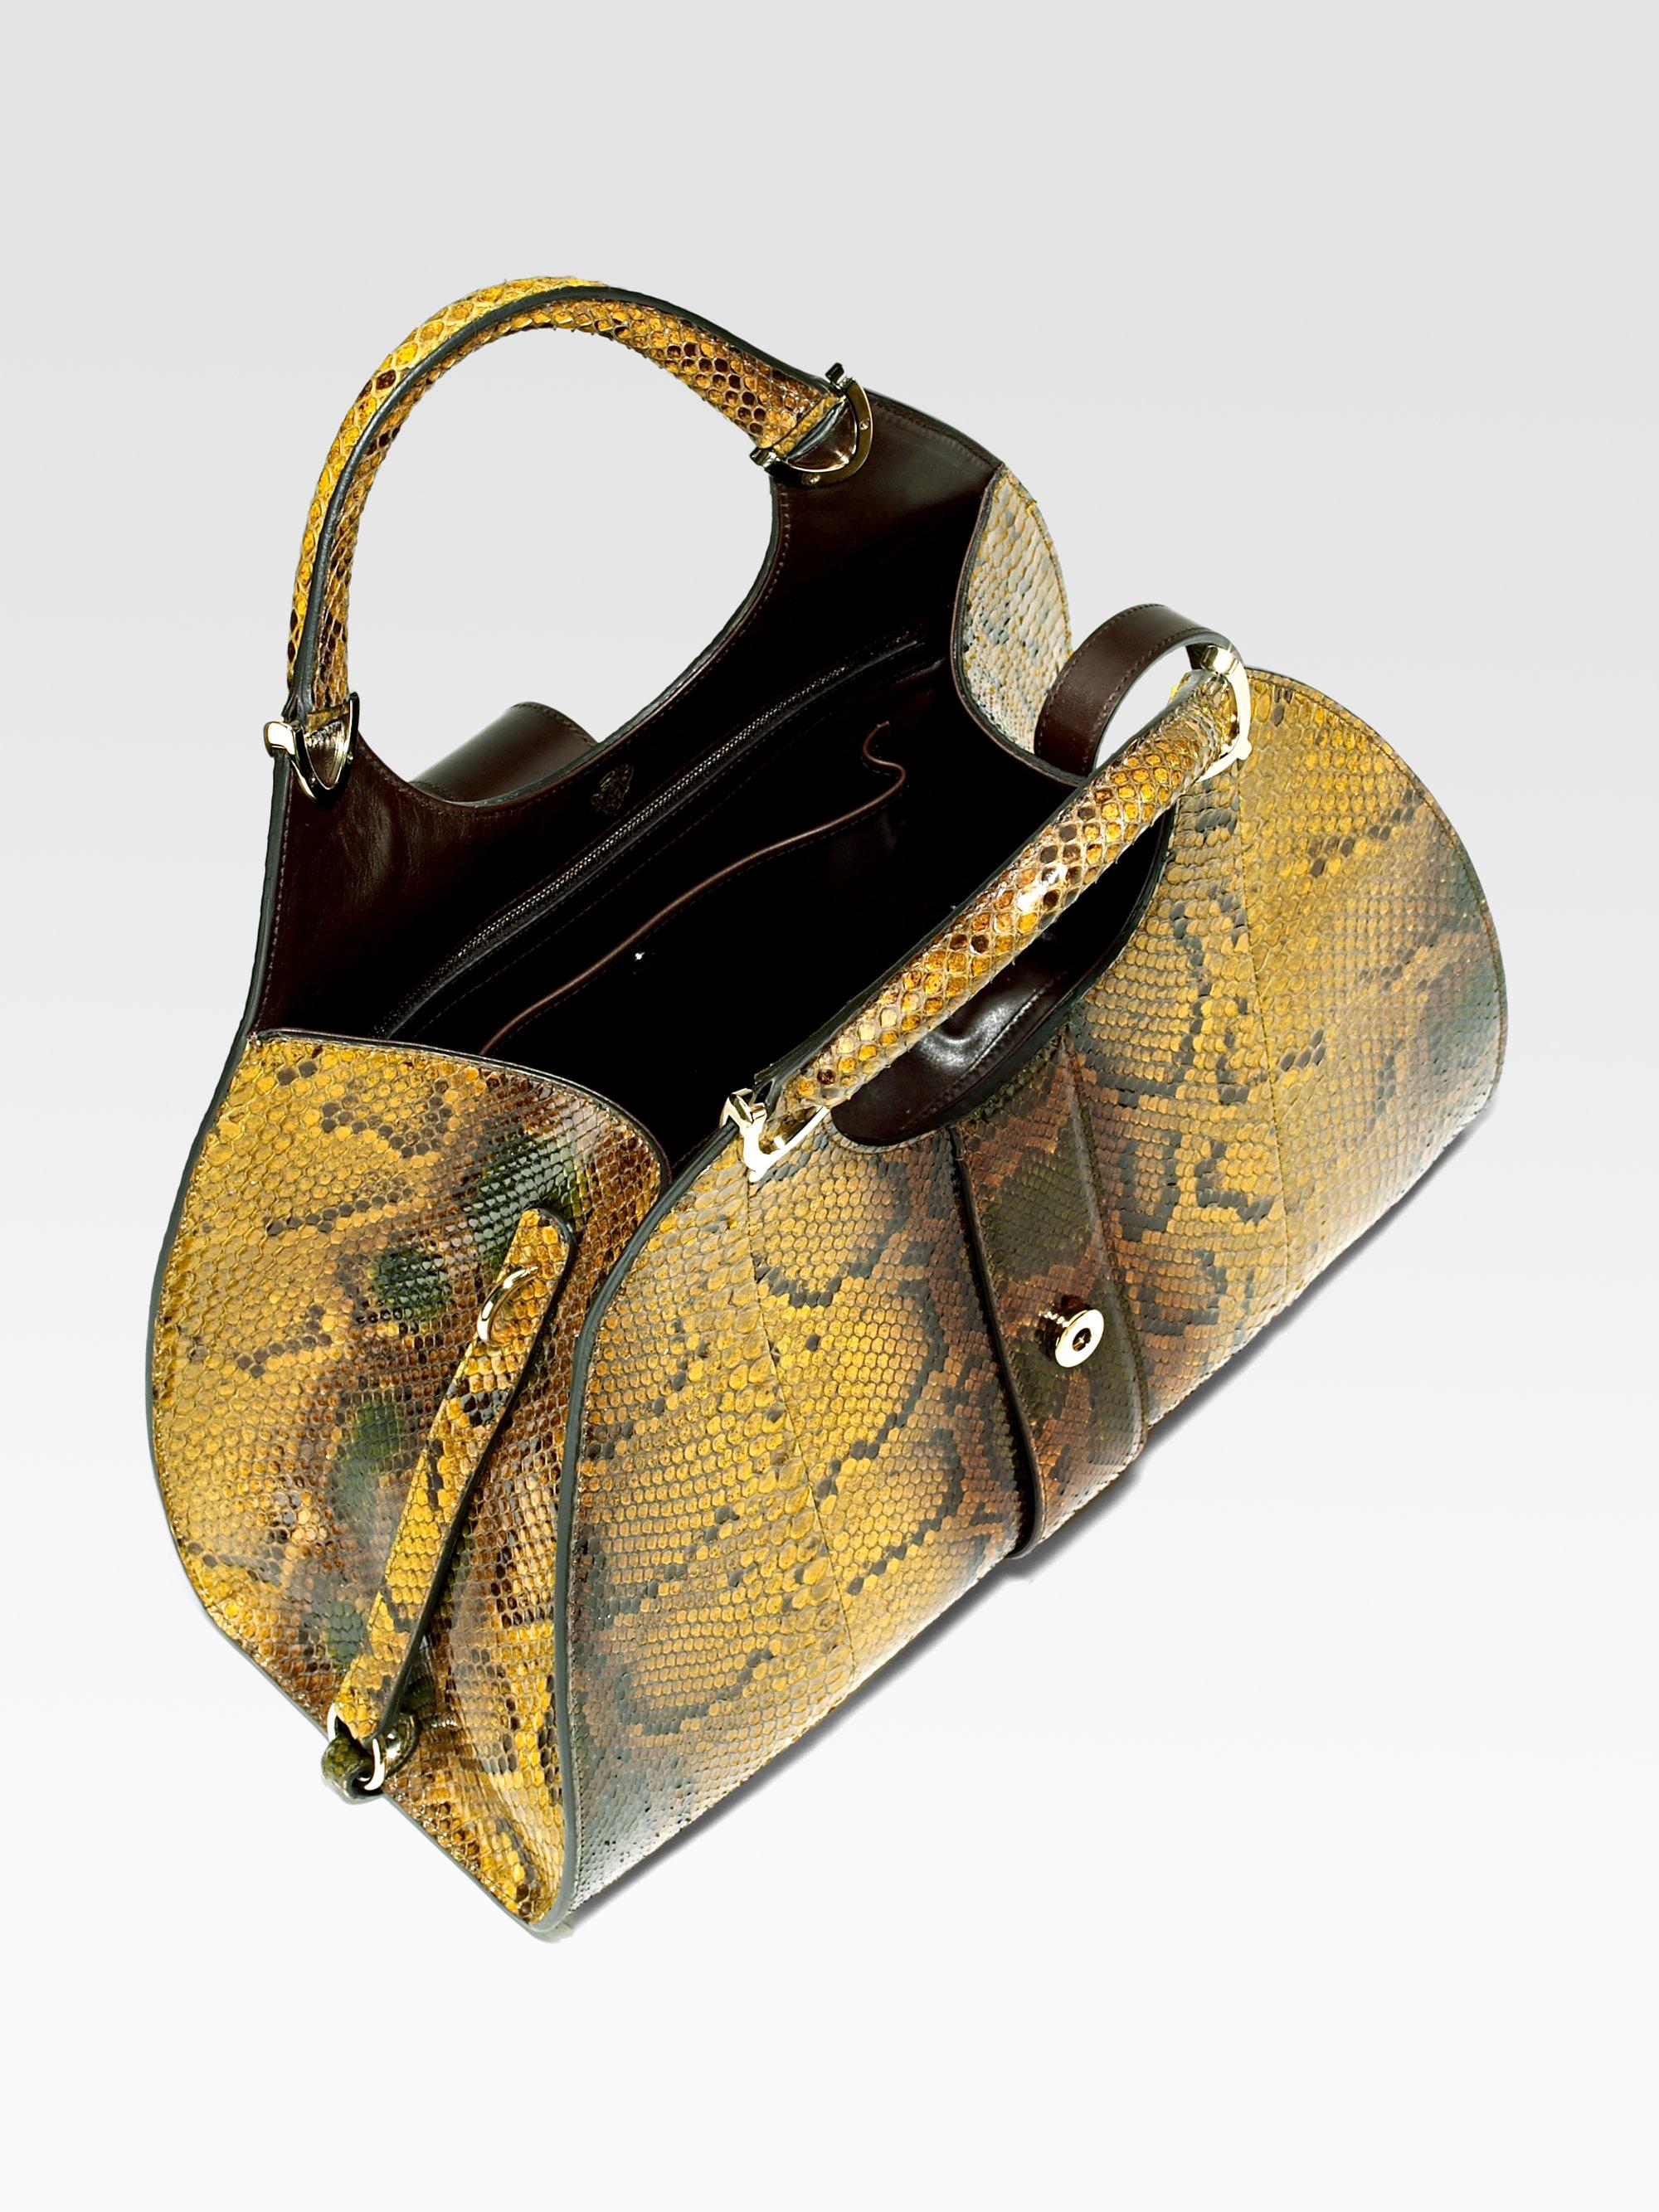 eca4a17117e4 Gucci Python Stirrup Medium Top Handle Bag in Metallic - Lyst